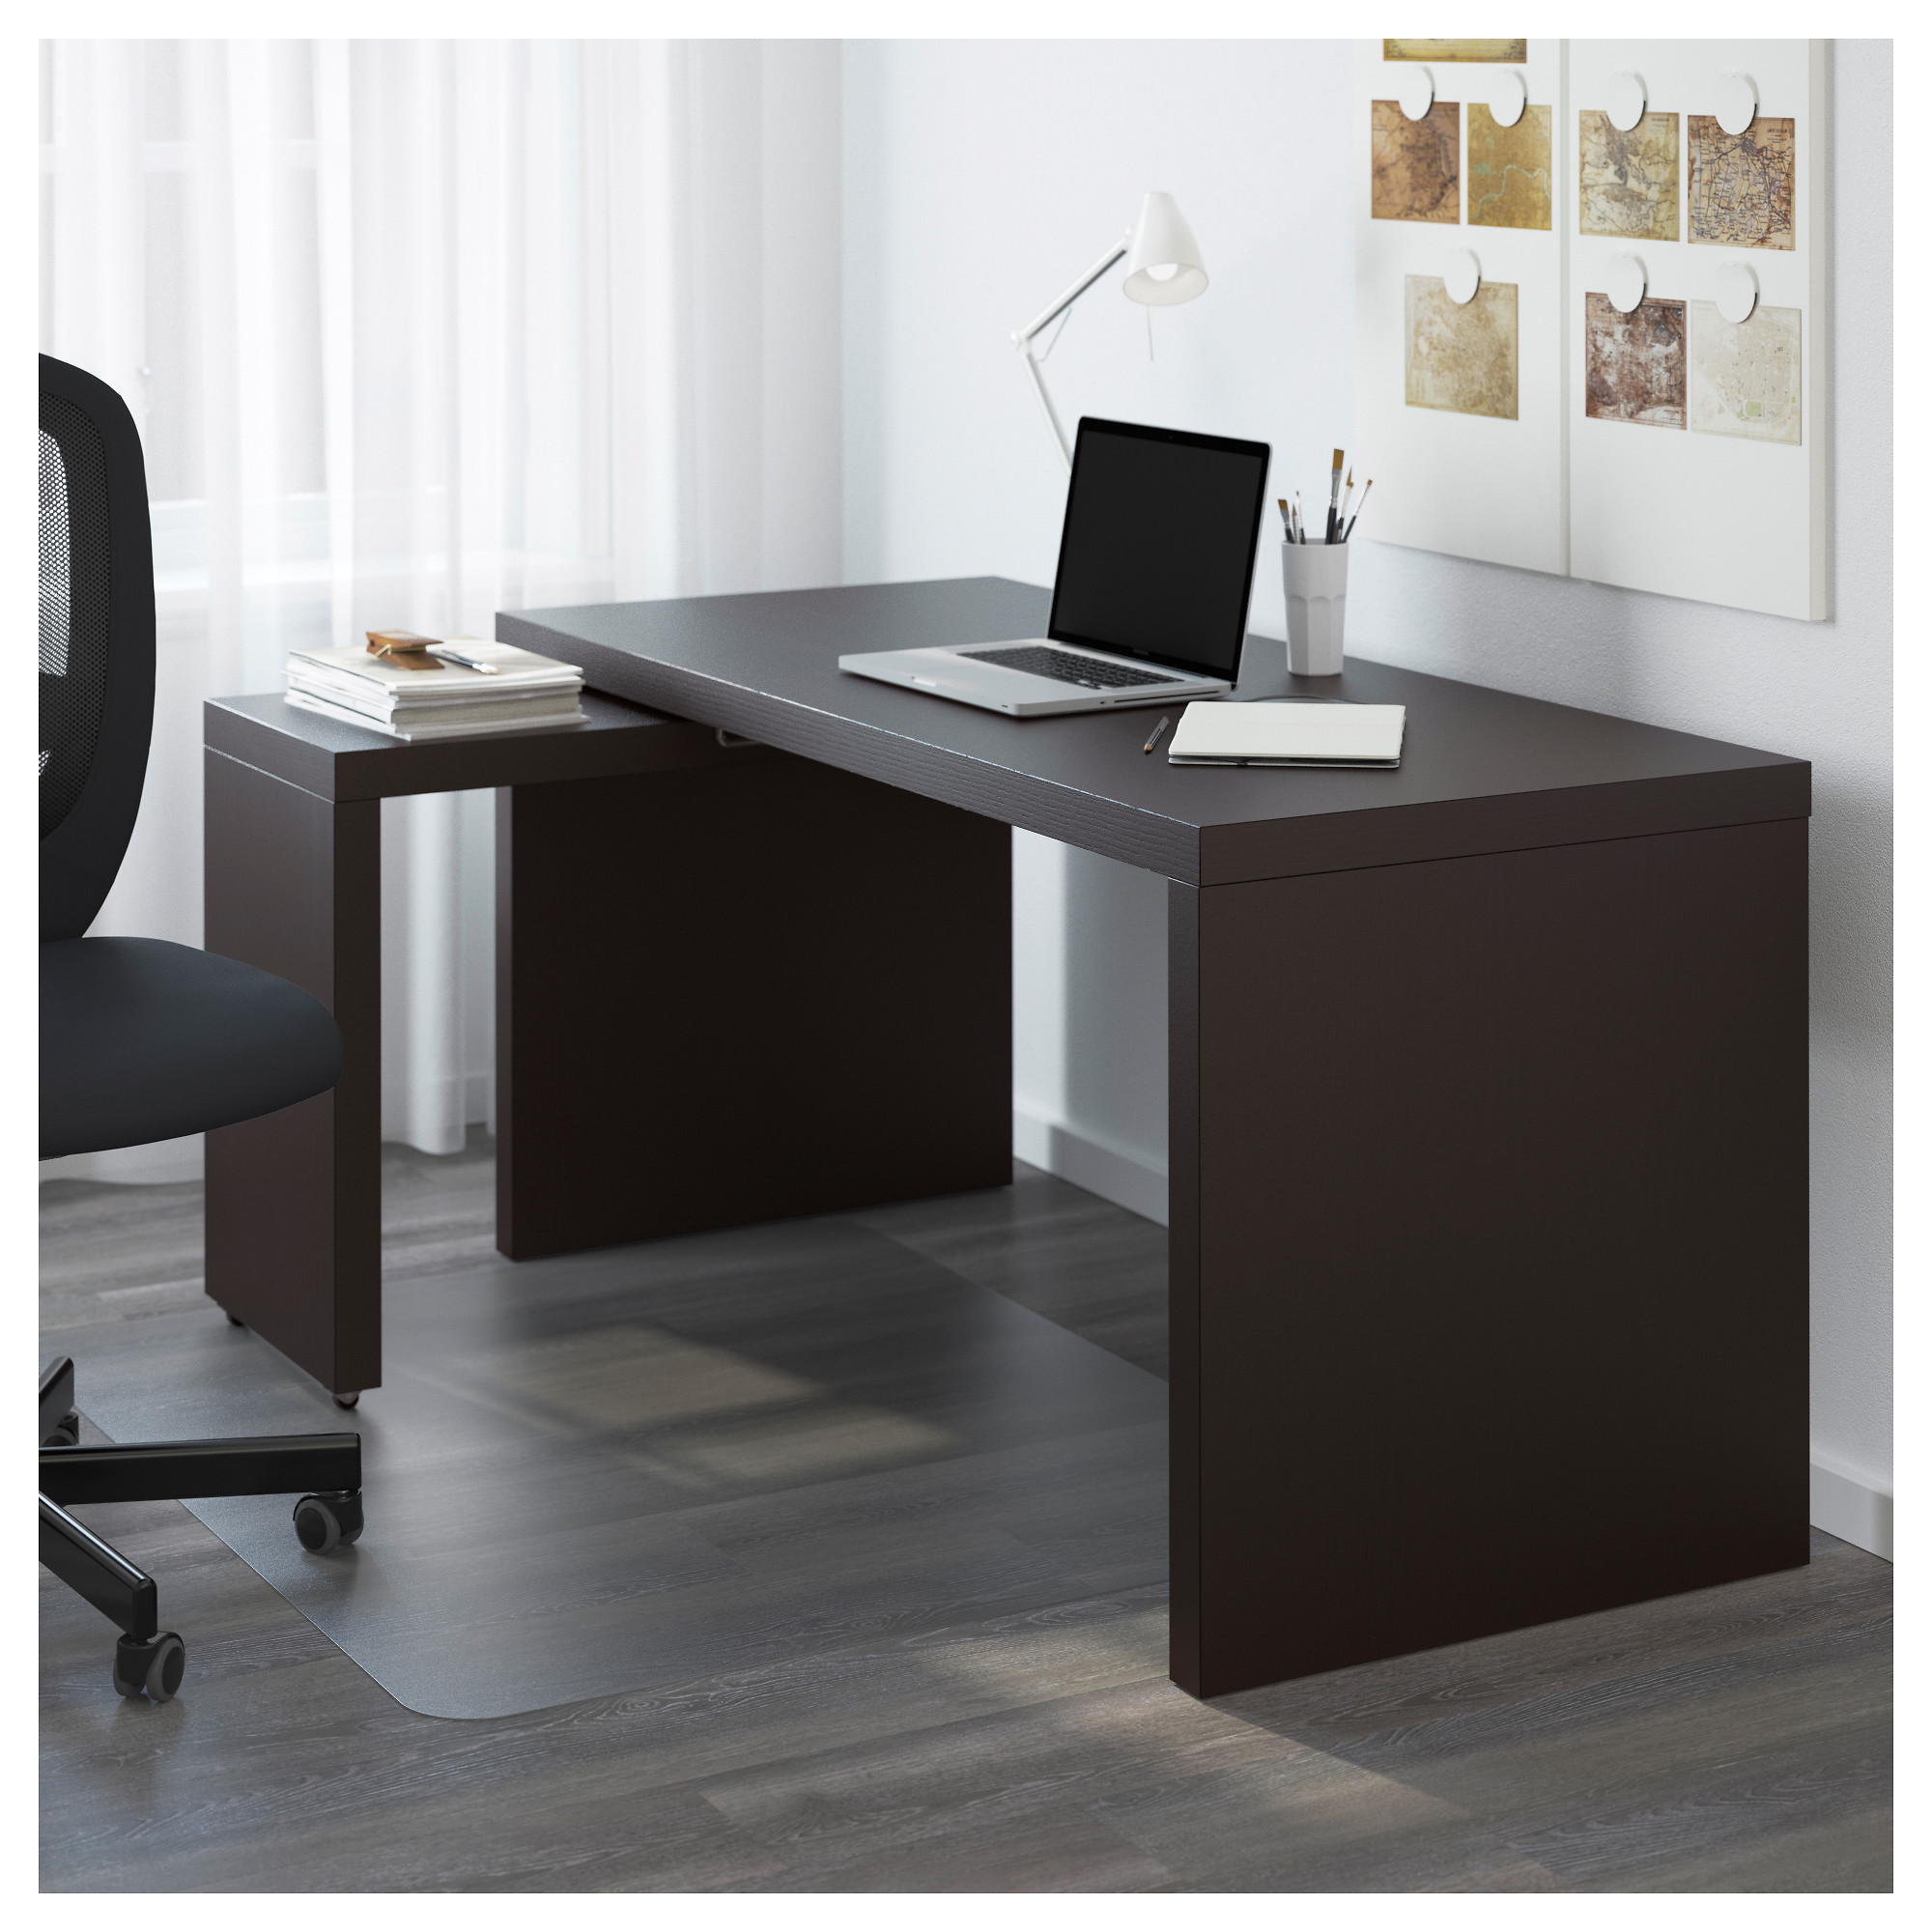 Ikea Galant Desk 11501 Instructions Bedford Corner Desk Craigslist Desk Ideas